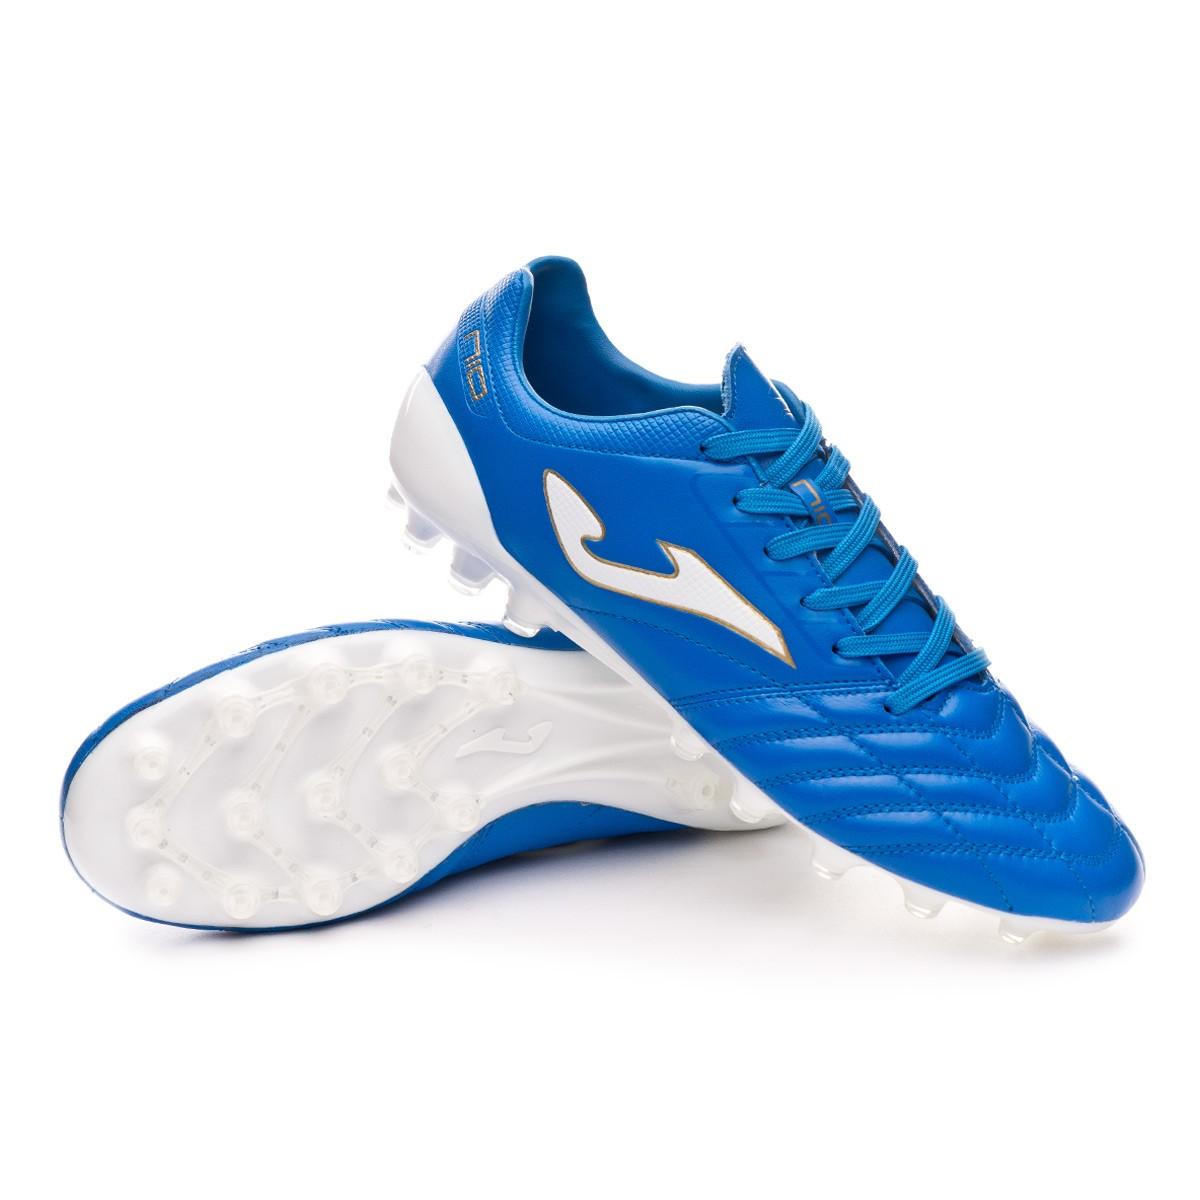 352b56f512 Chuteira Joma N-10 Pro AG Blue-White - Loja de futebol Fútbol Emotion